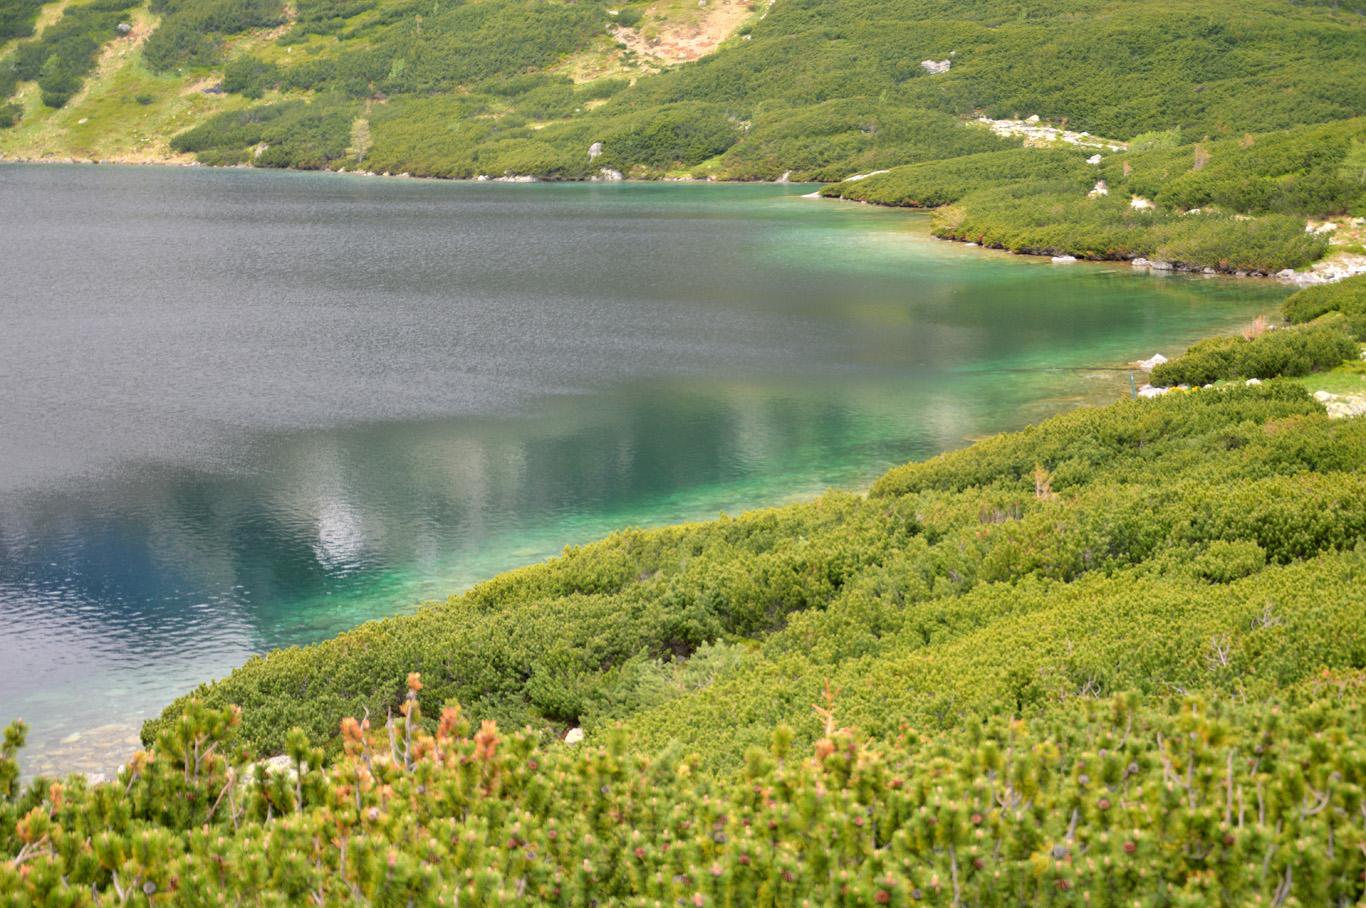 Emerald waters of Wielki Staw Polski (The Great Polish Lake)